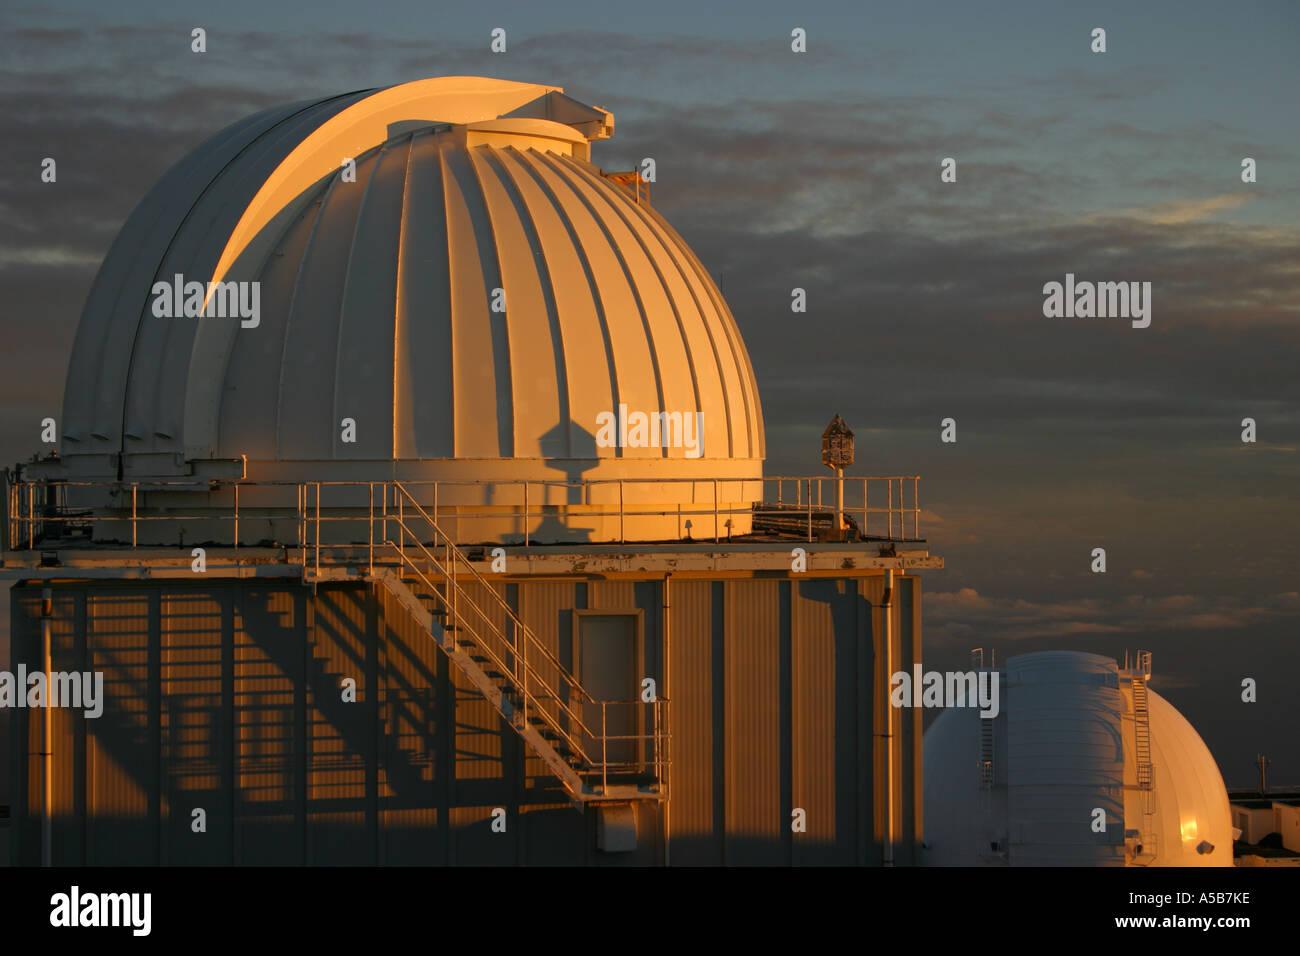 Kapteyn newton teleskope u redaktionelles stockfoto laagudo